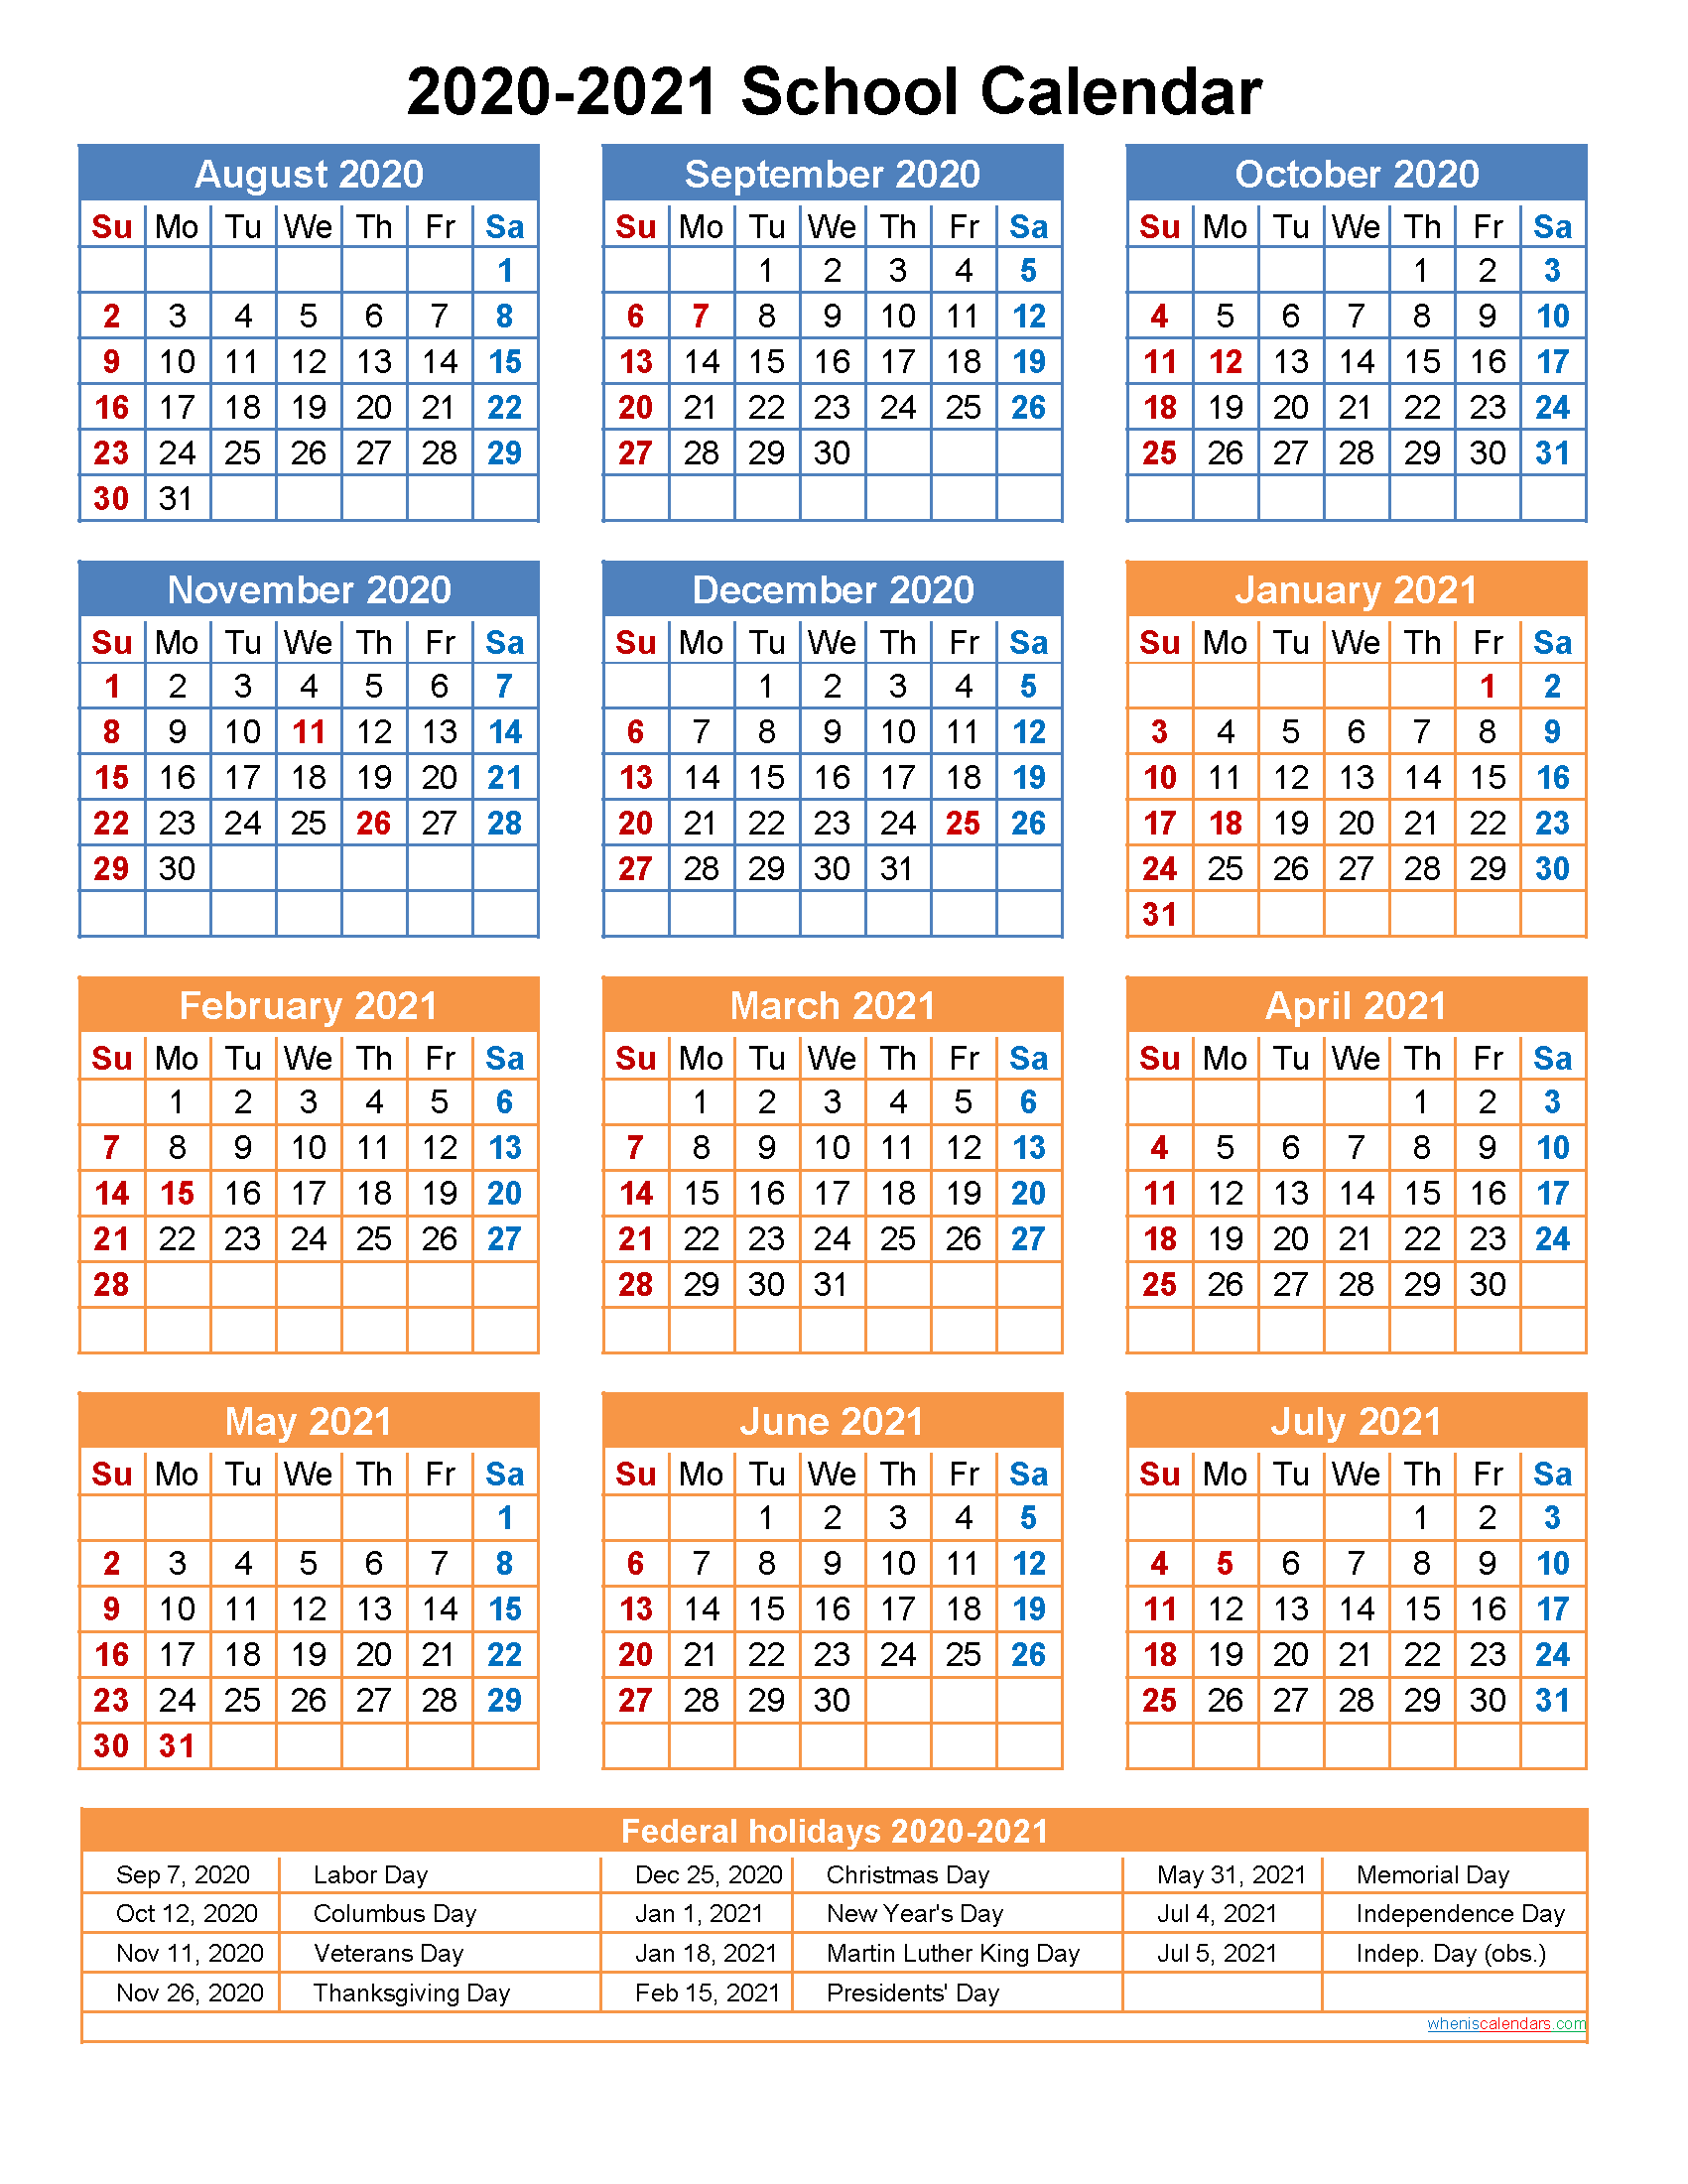 2020 And 2021 School Calendar Printable (Portrait)  Template With Printable 2020 2021 School Calendar